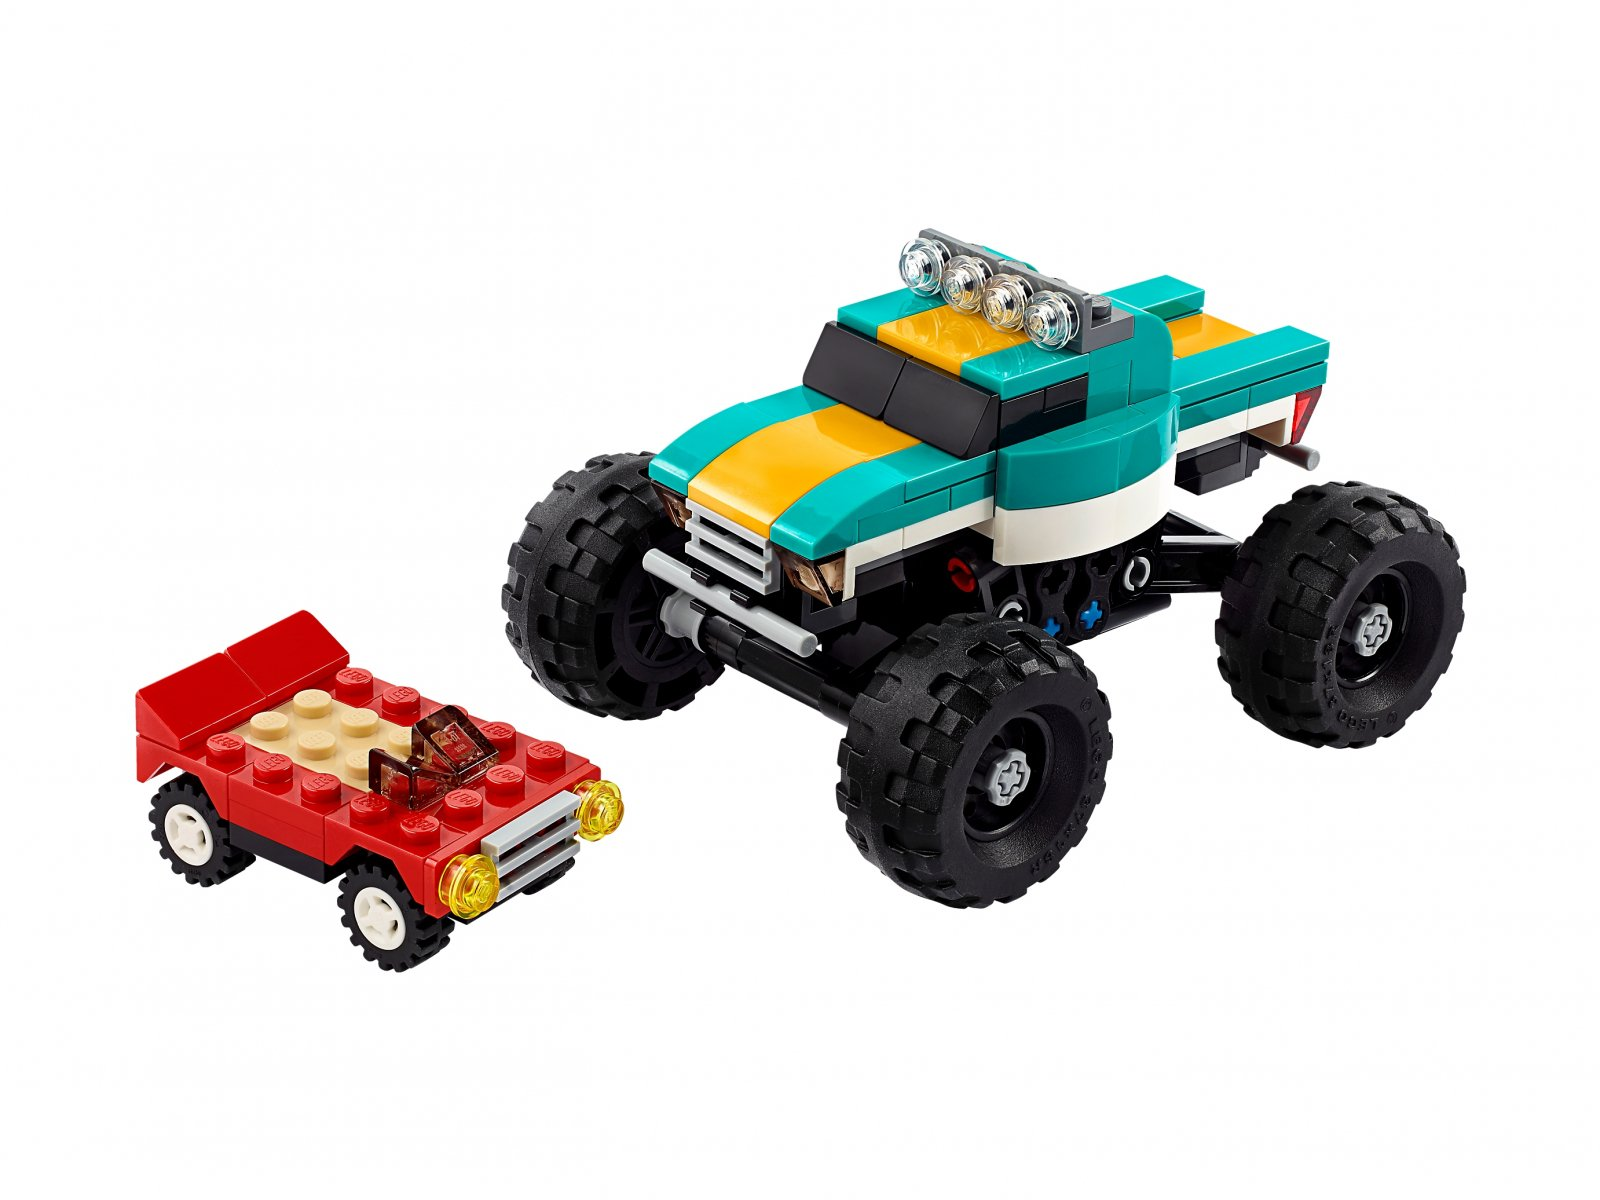 LEGO Creator 3 w 1 31101 Monster truck